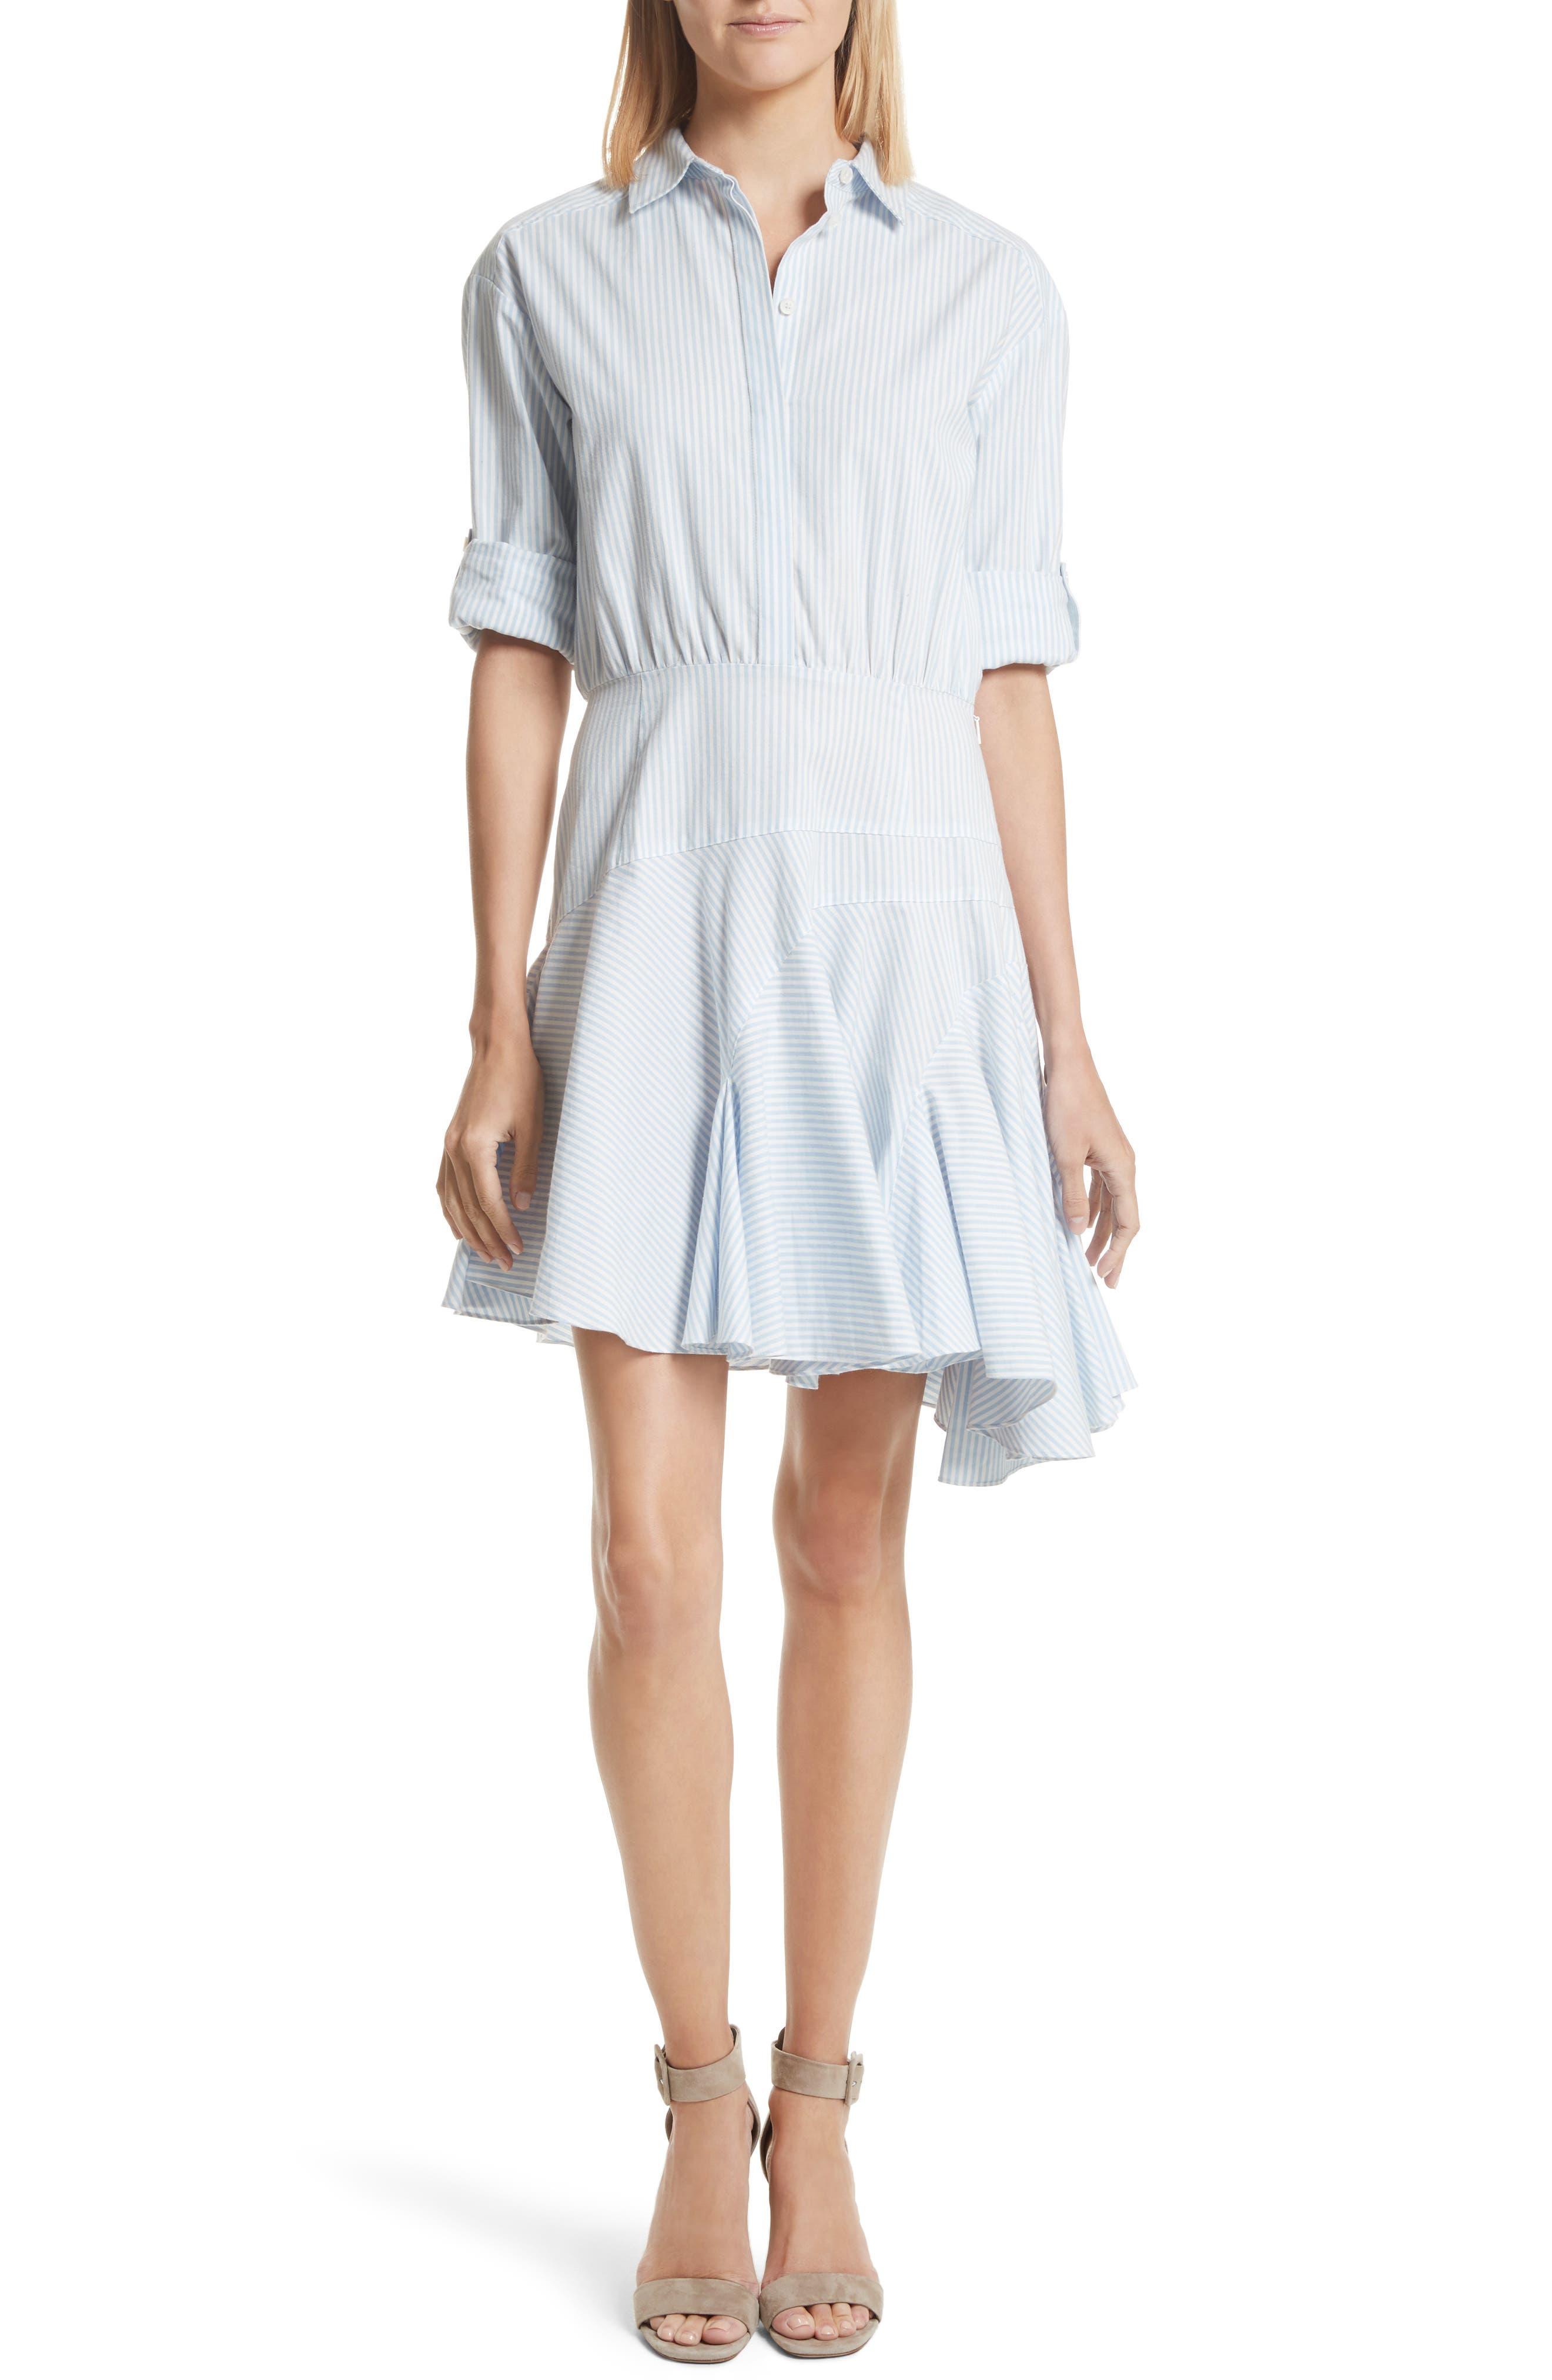 GREY Jason Wu Stripe Cotton Dress